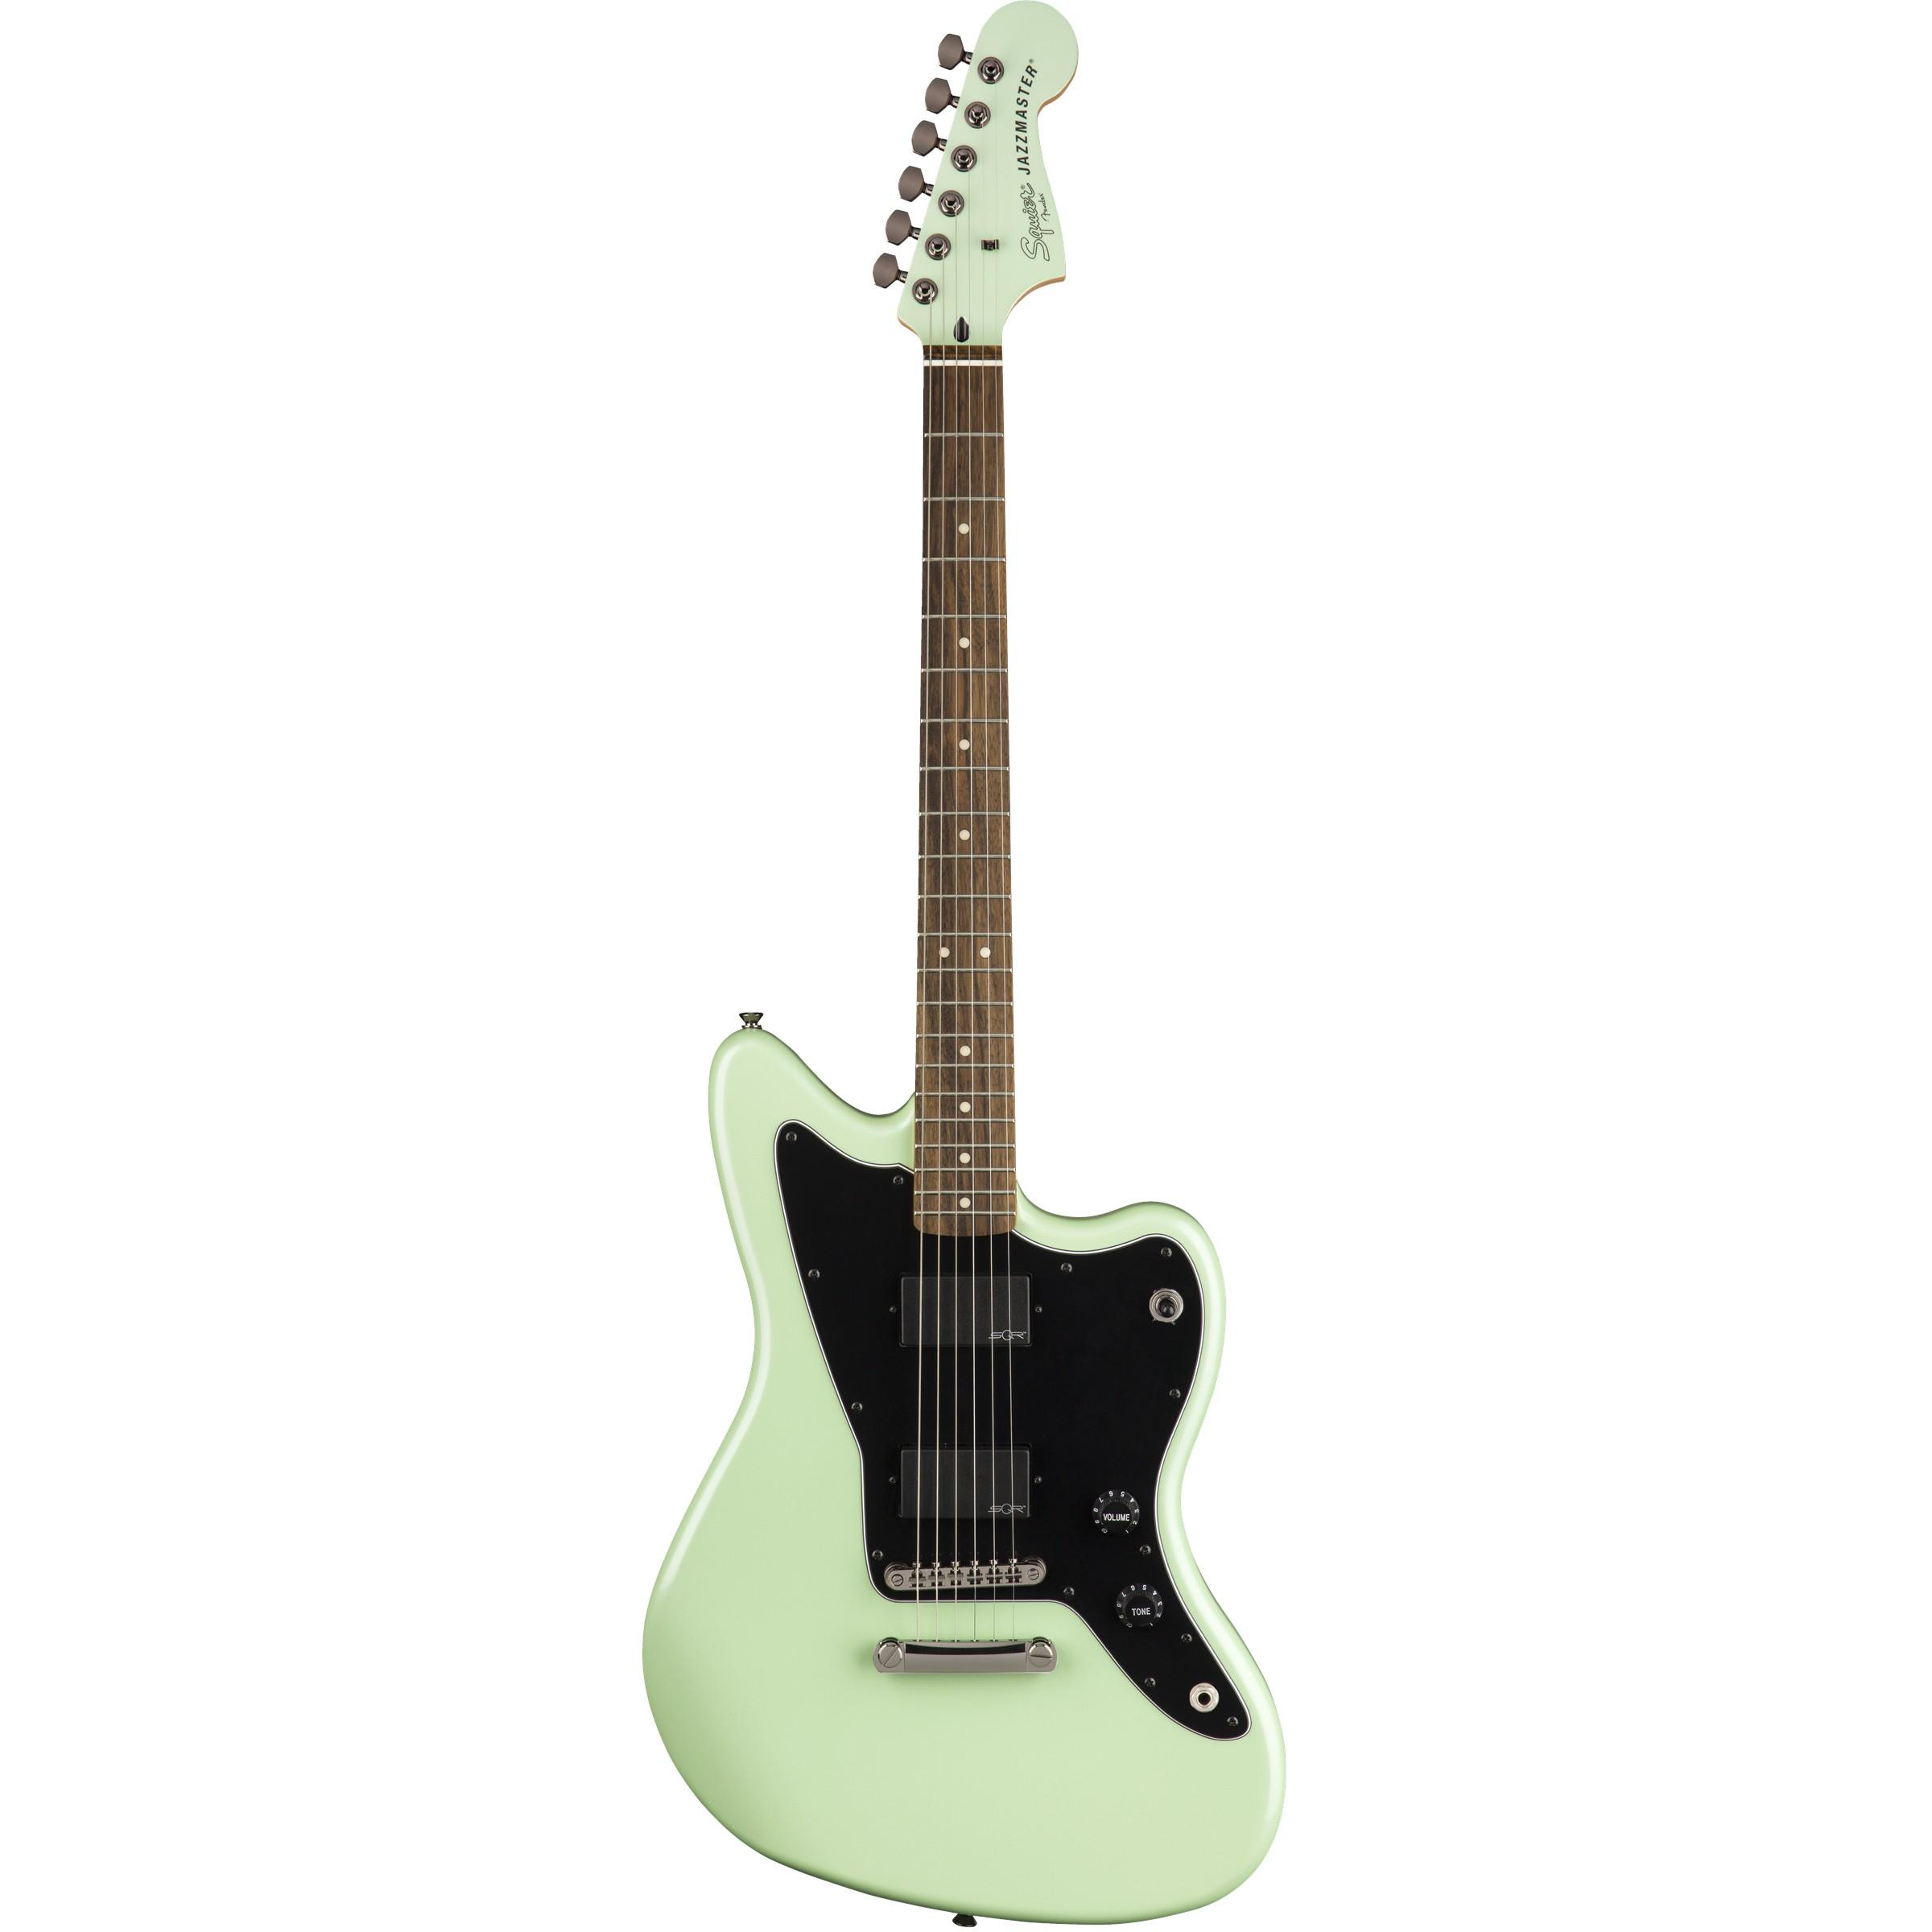 Fender Squier Contemporary Active Jazzmaster ST LRL Surf Pearl